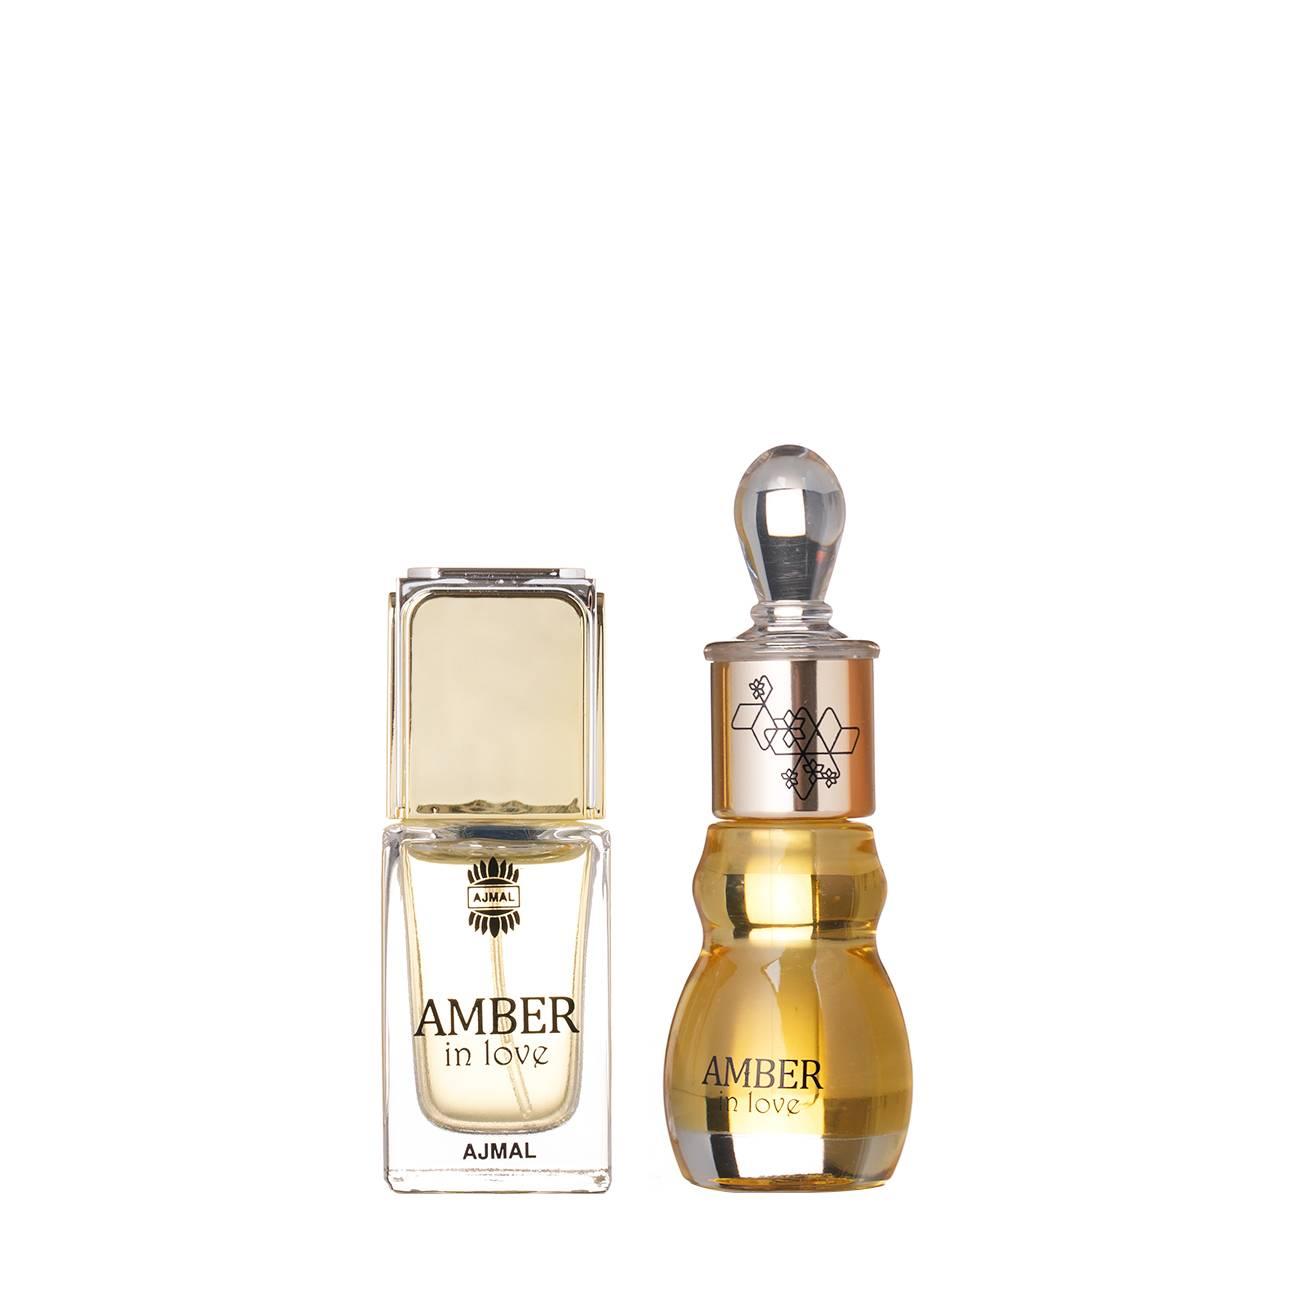 AMBER IN LOVE imagine produs